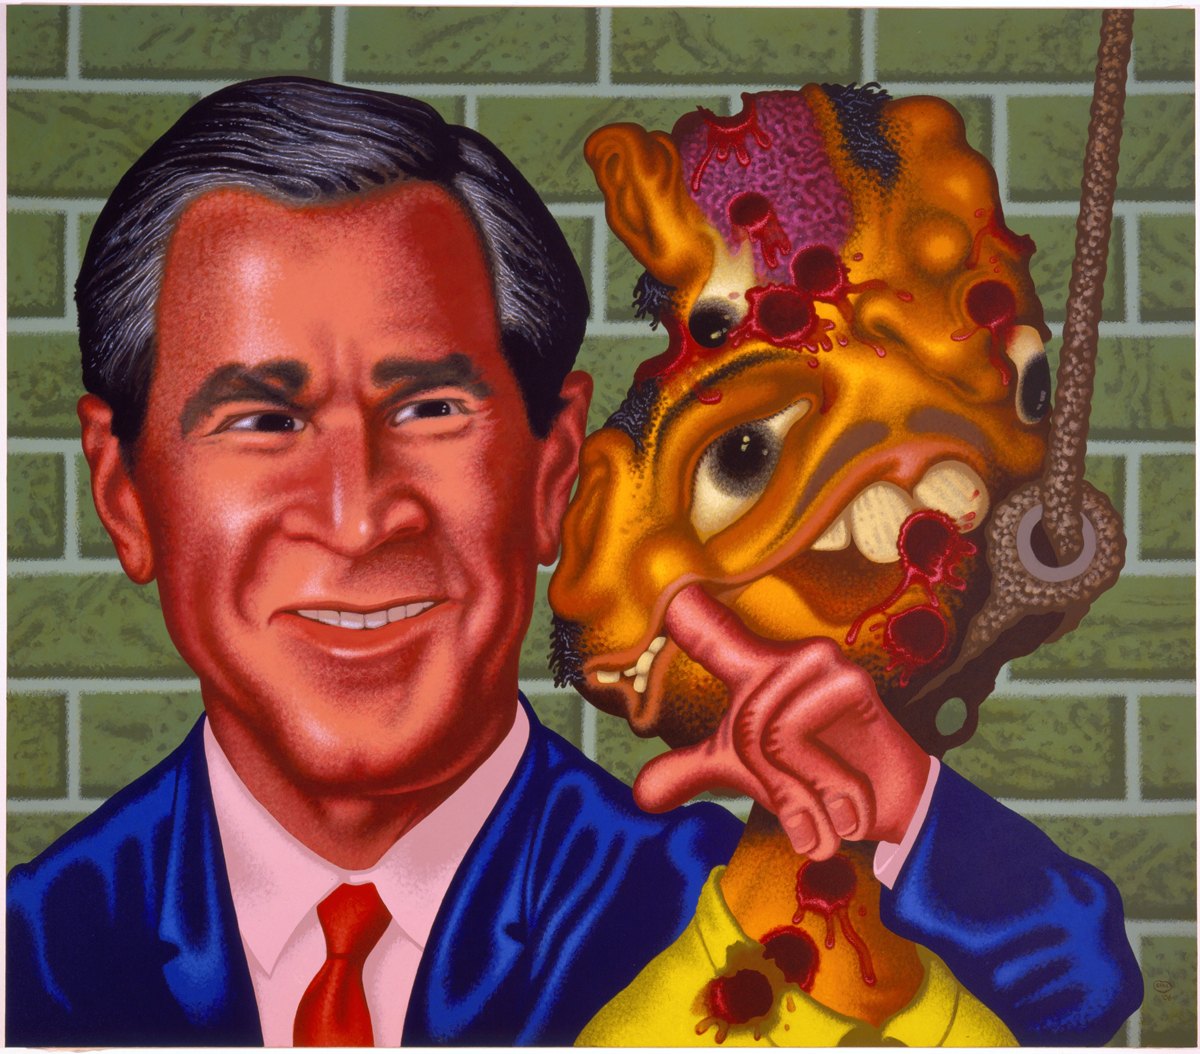 George Bush at Abu Ghraib by Peter Saul